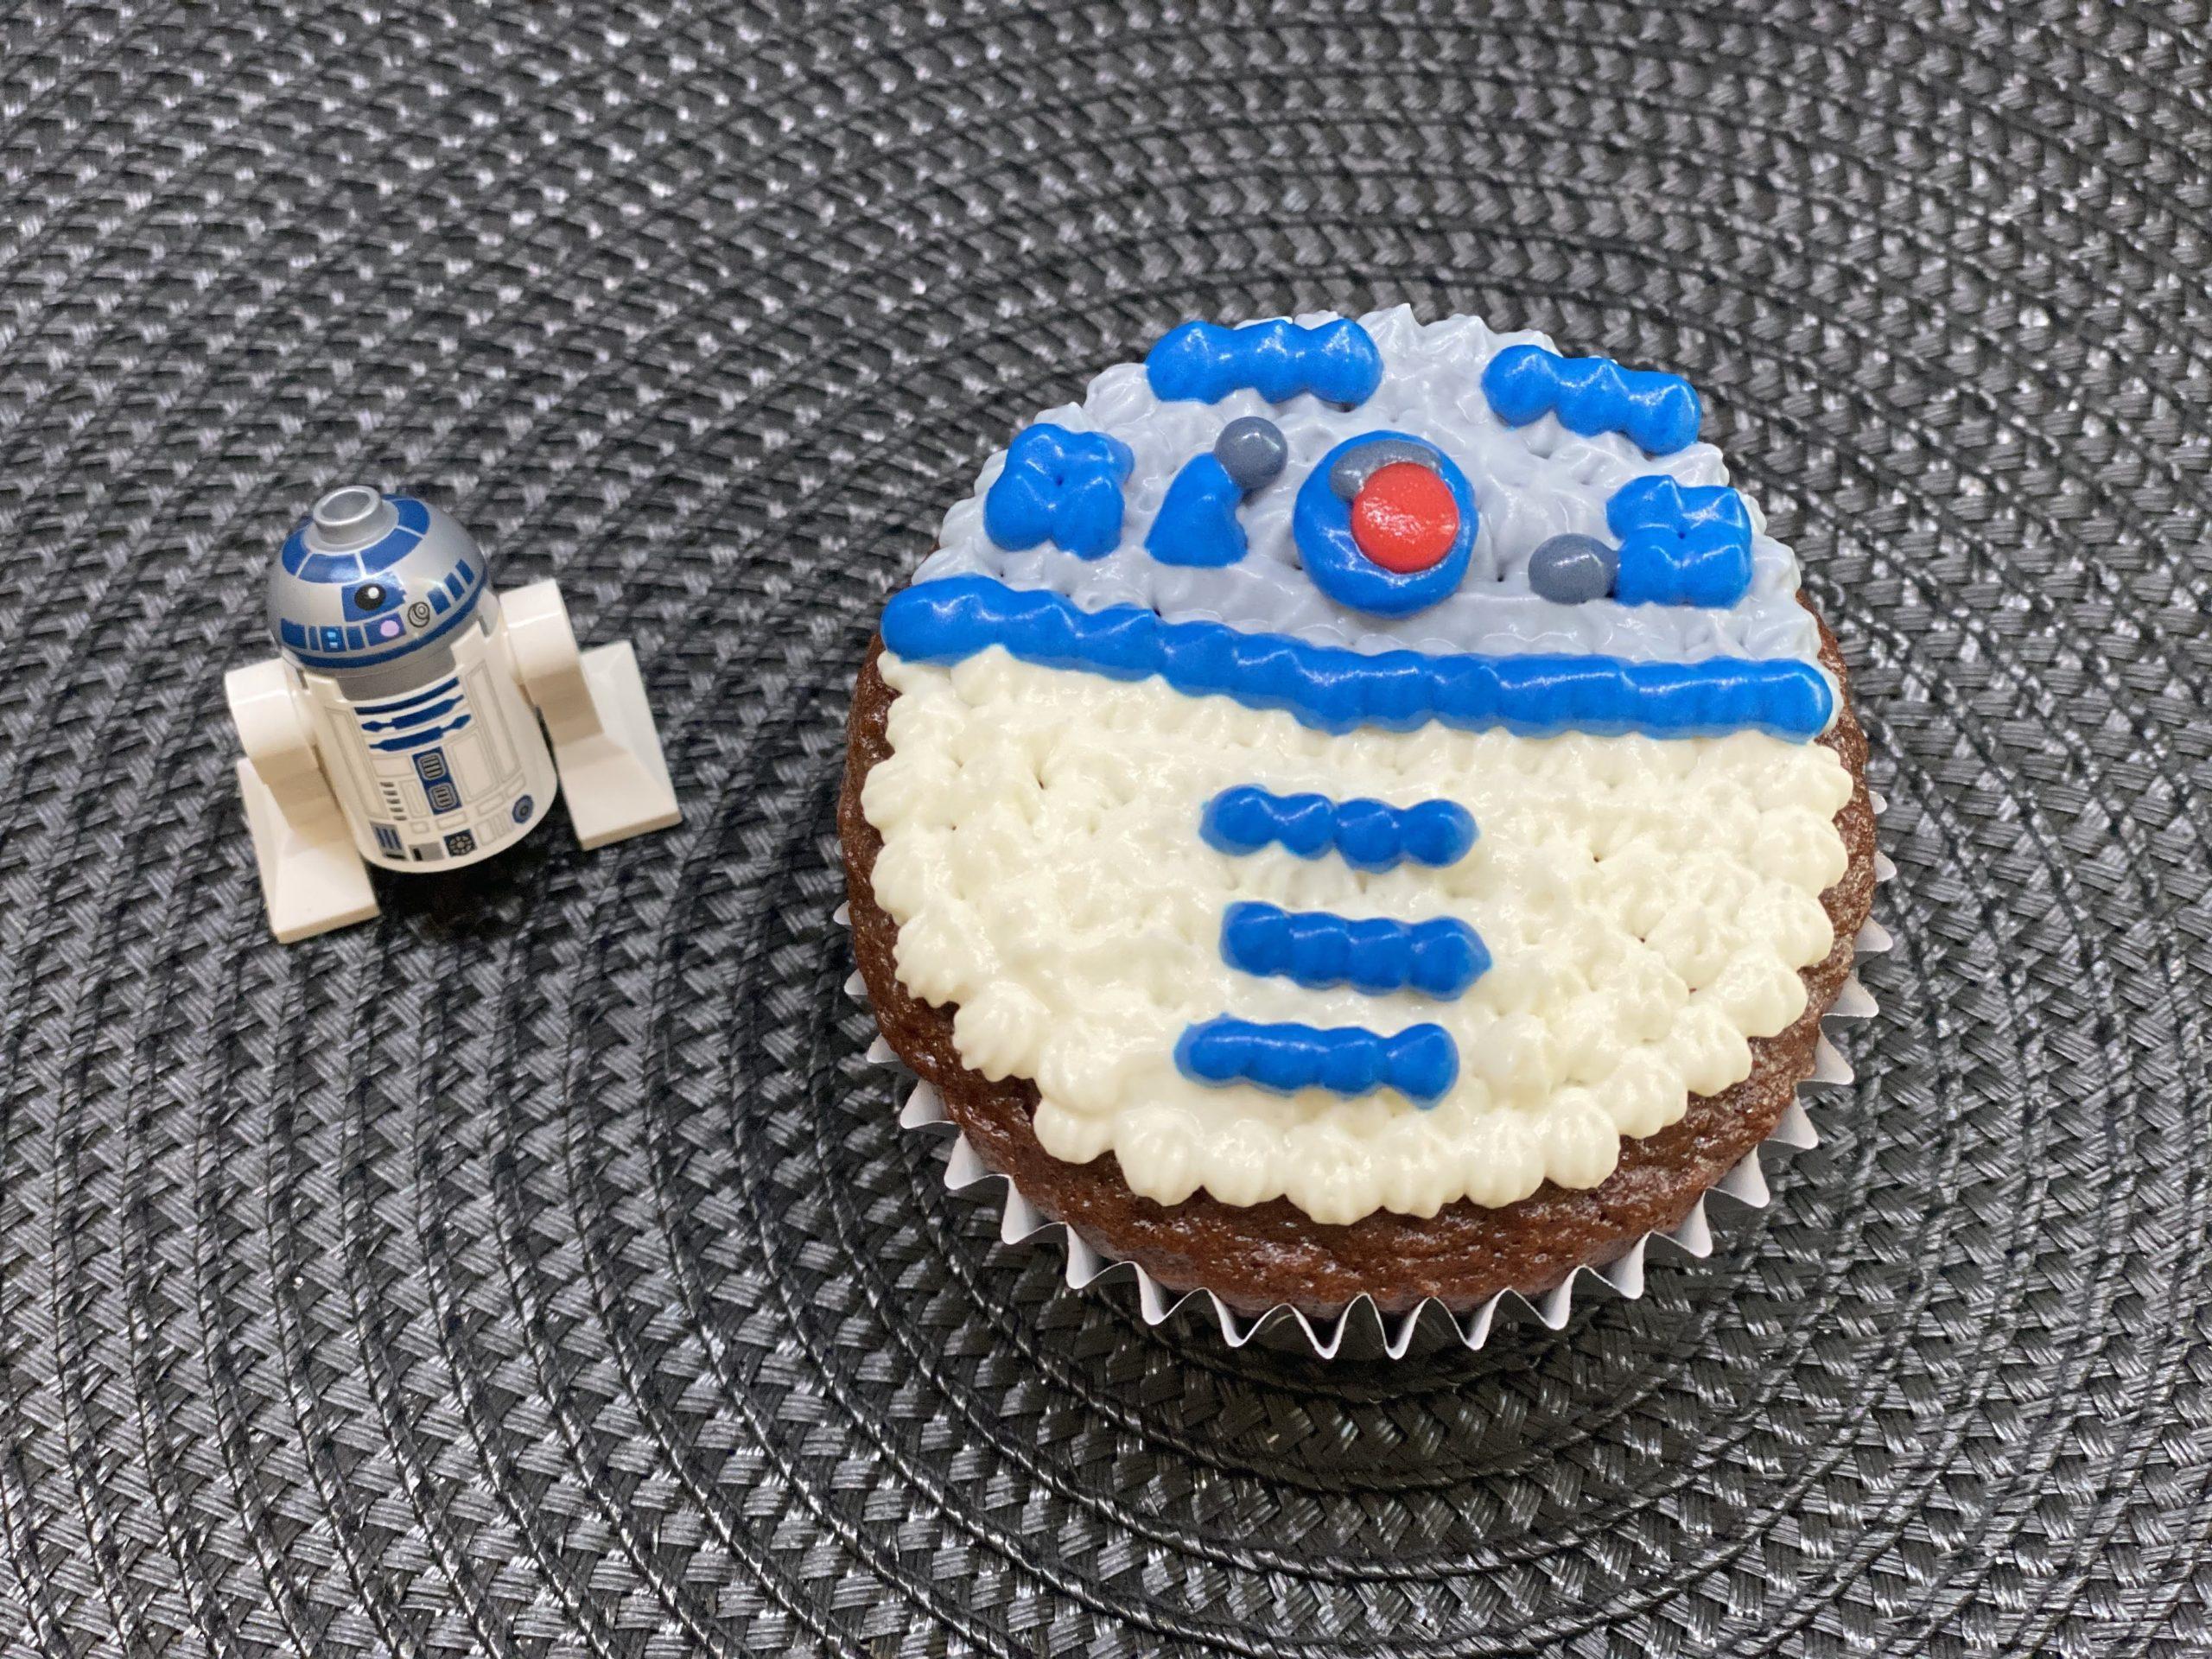 r2d2 cupcake